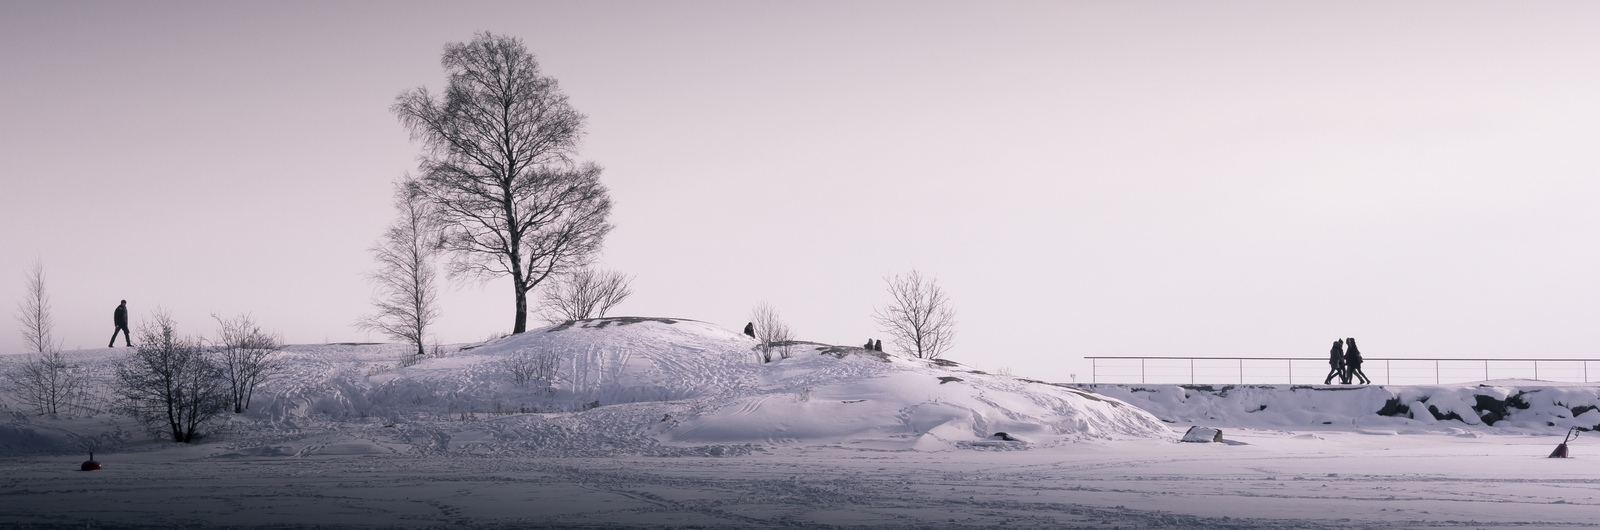 city header finland street snow